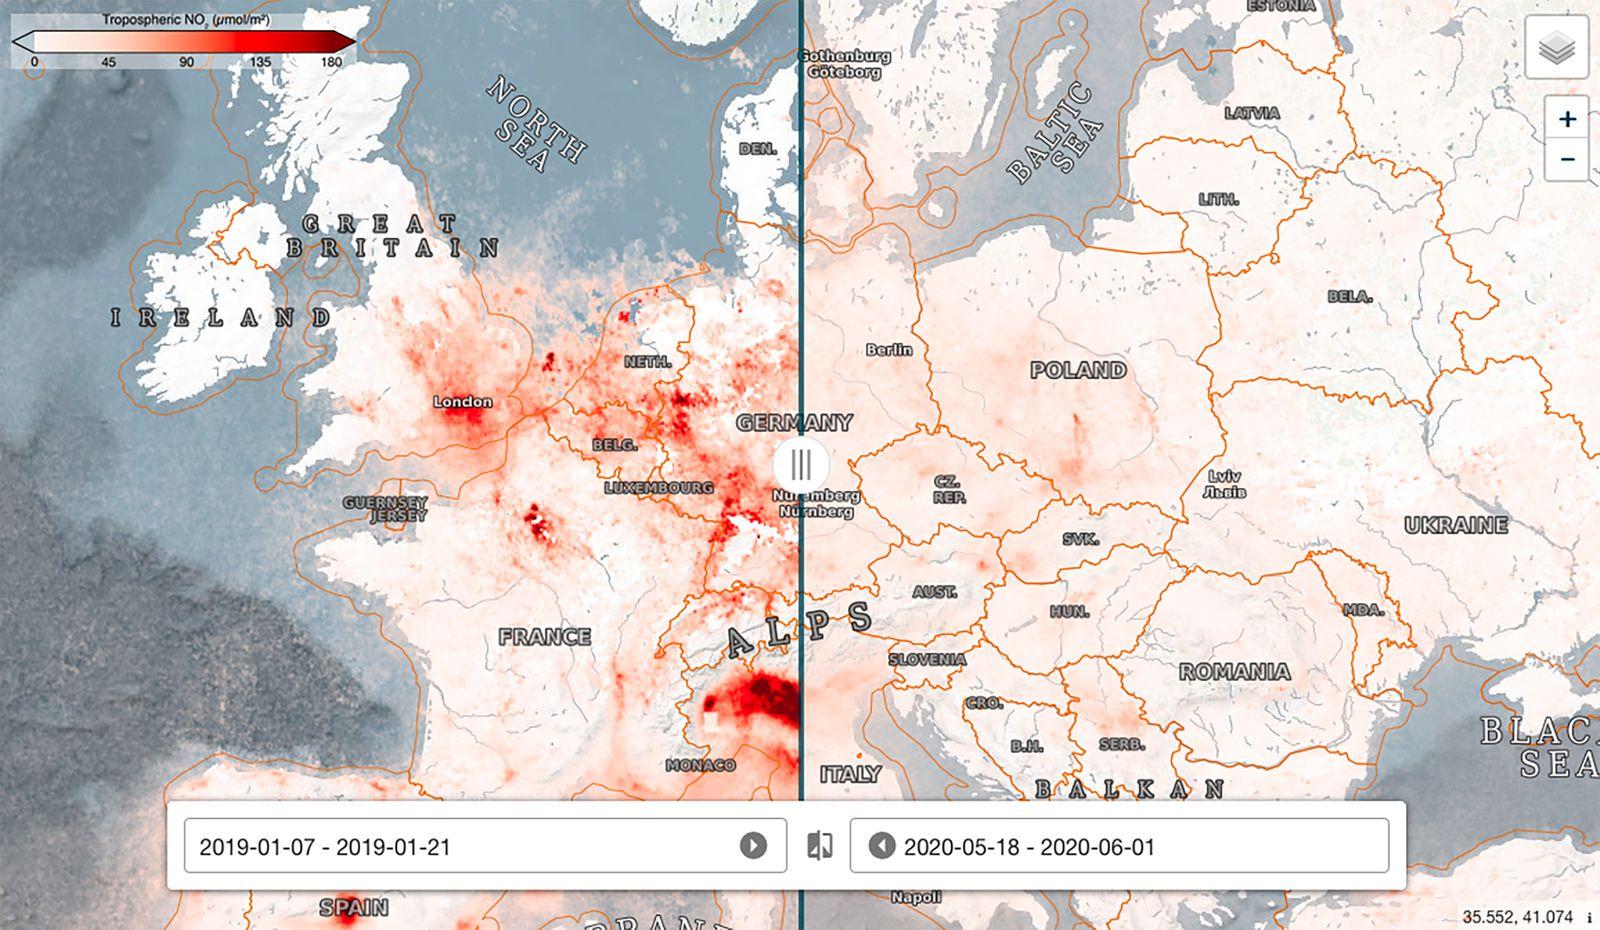 ESA Race Website - Nitrogen dioxide concentrations Europe